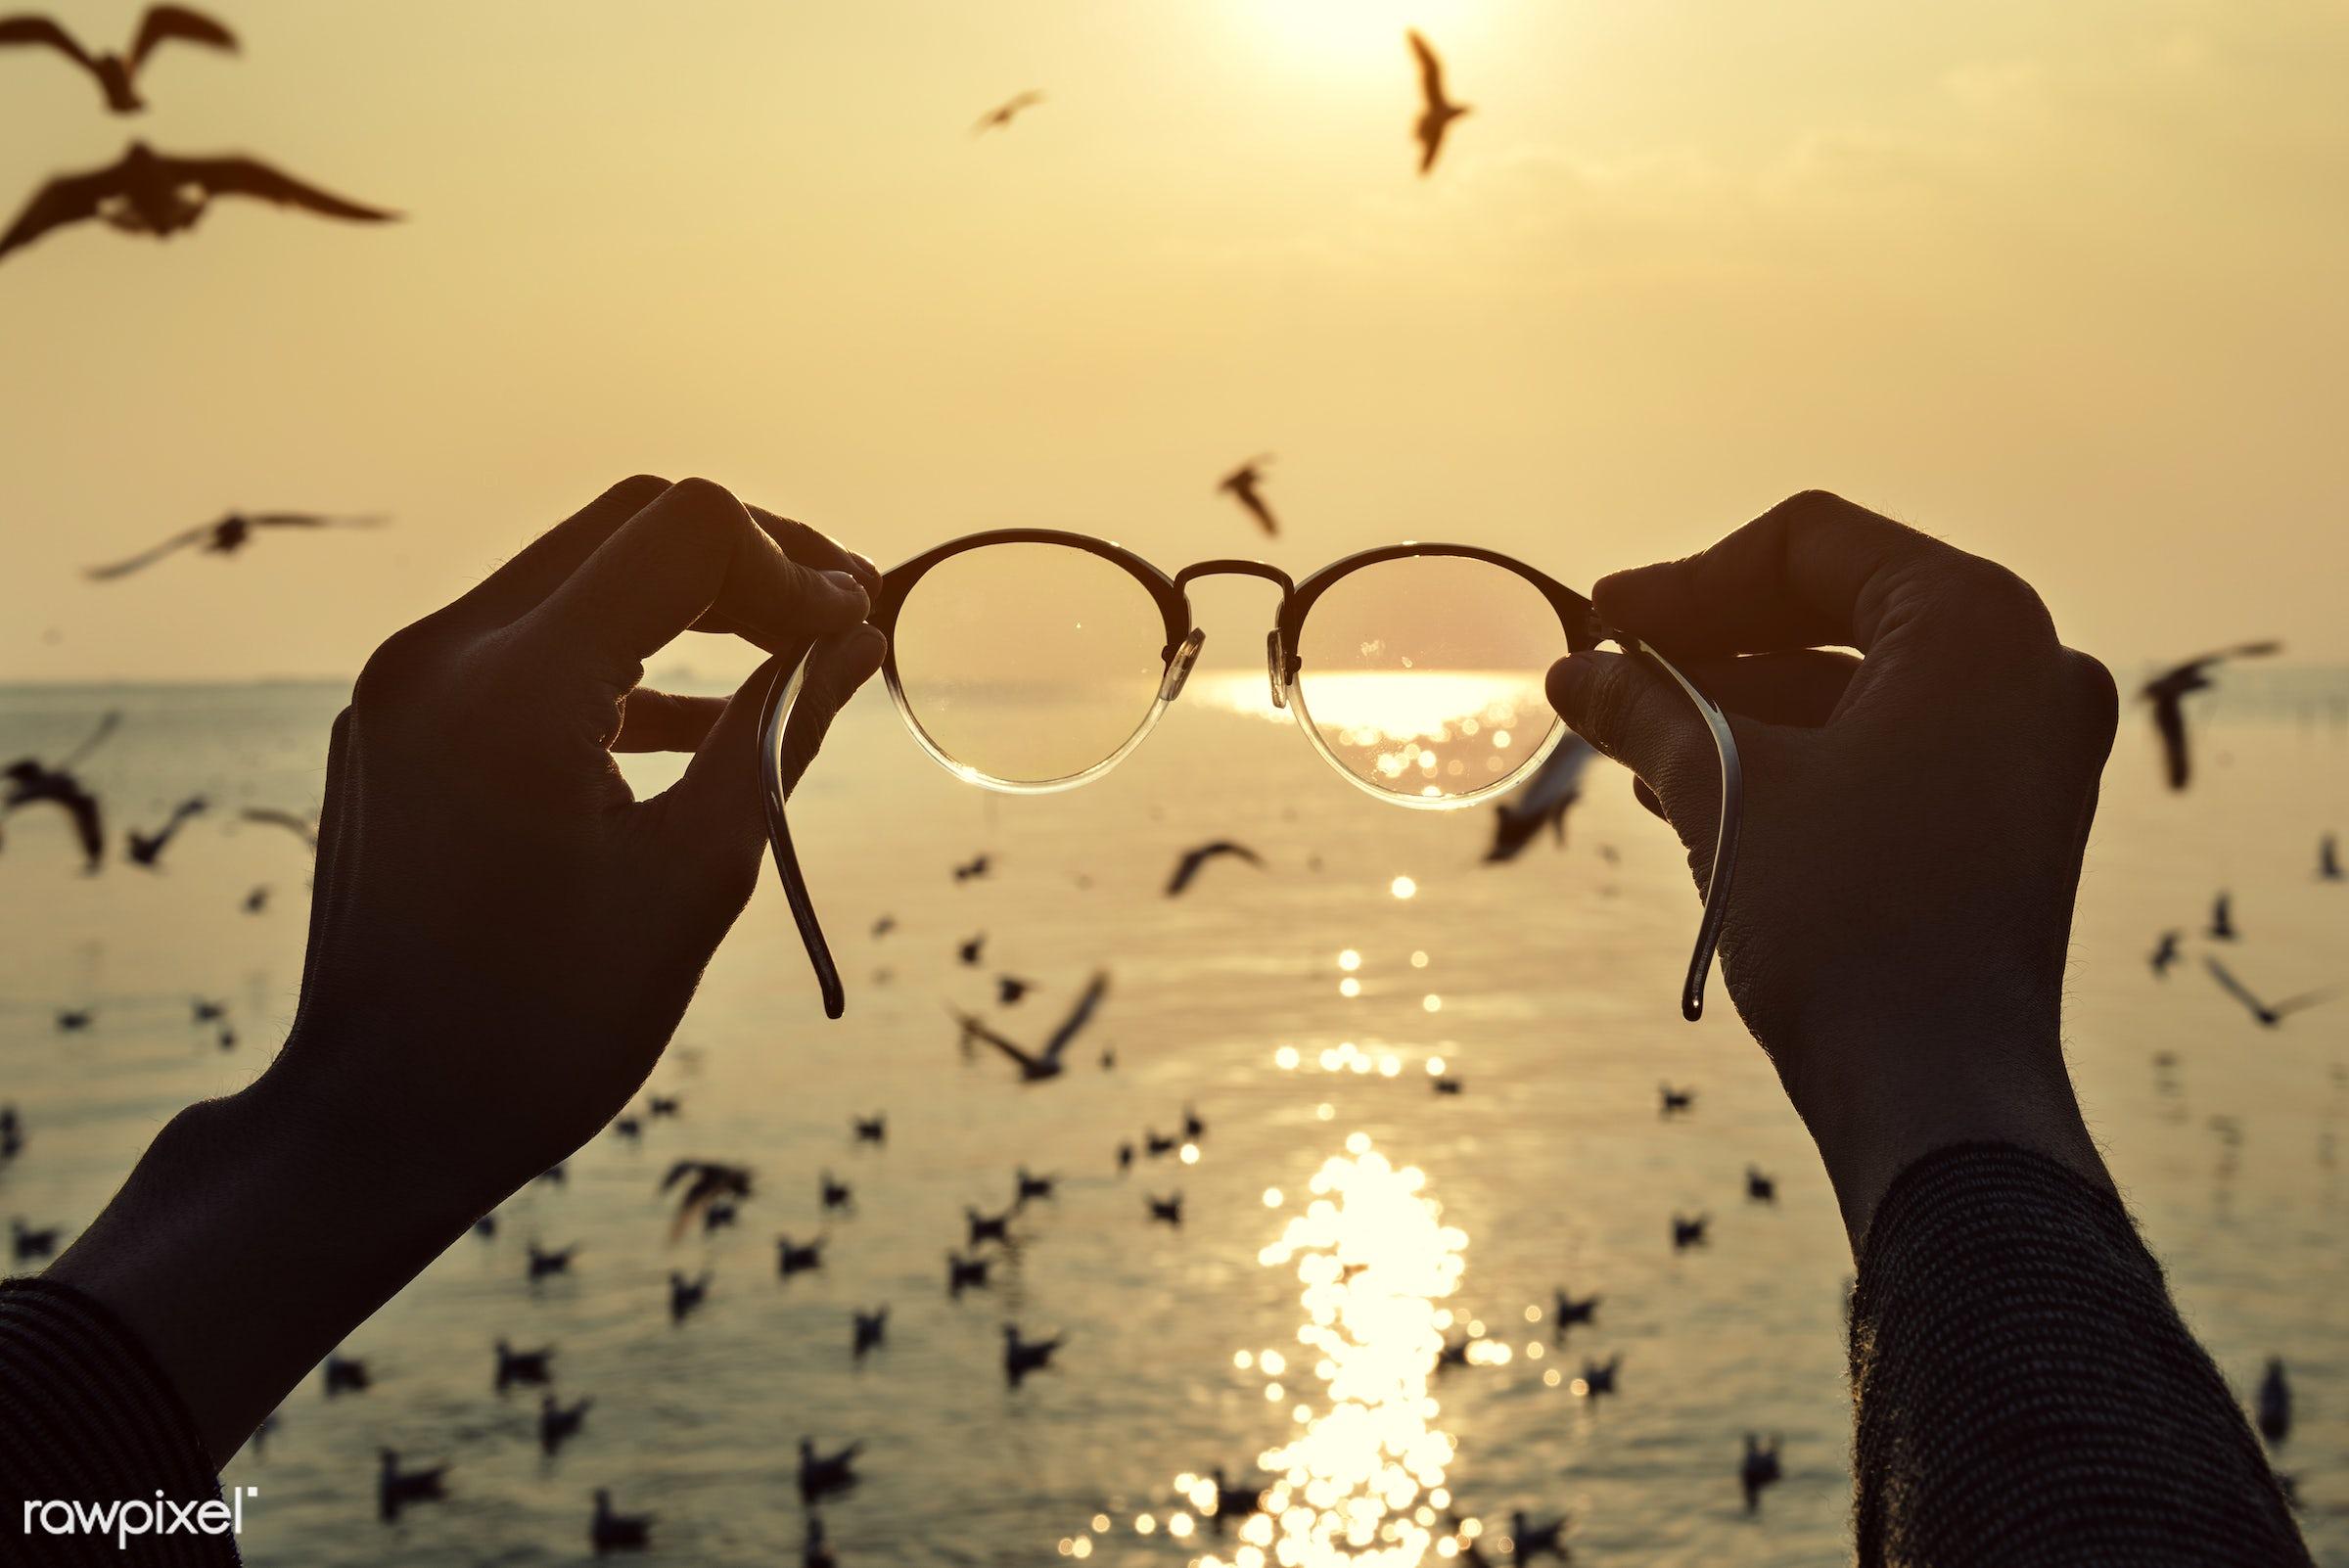 sunset, bird, flying, sky, nature, outdoors, eyeglasses, hands, holding, glasses, animal, water, ocean, sea, fligth,...